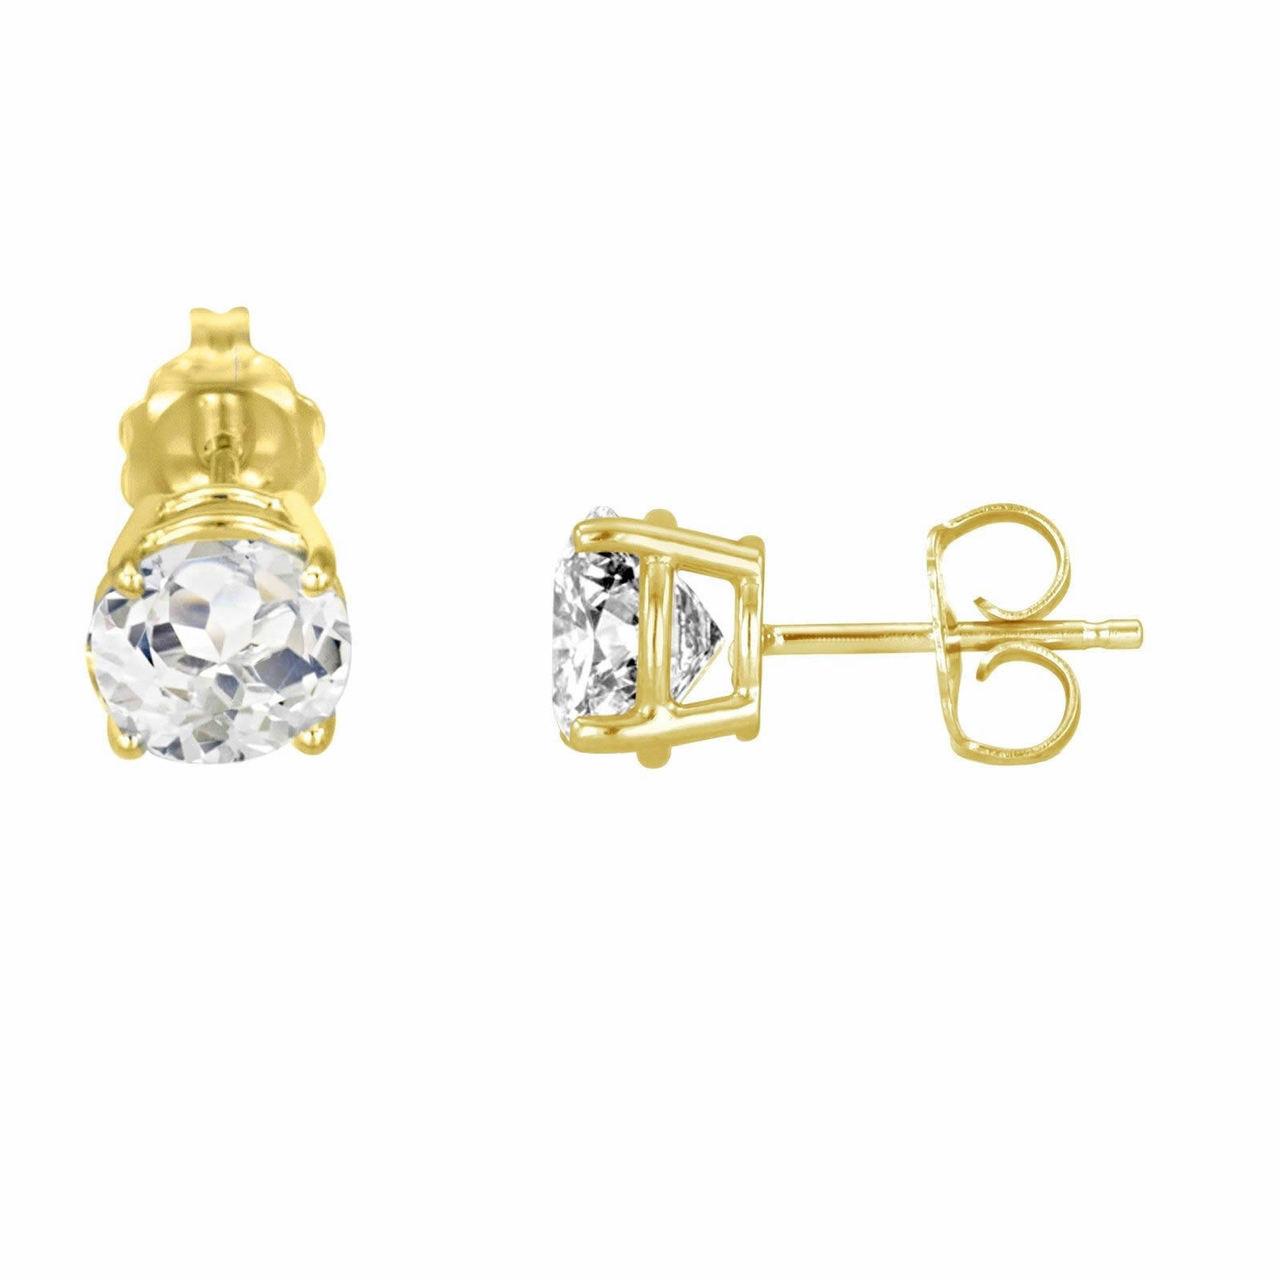 a0bdbfc3e 14k Yellow Gold White Topaz Stud Earrings 2.00 Carat HandMade